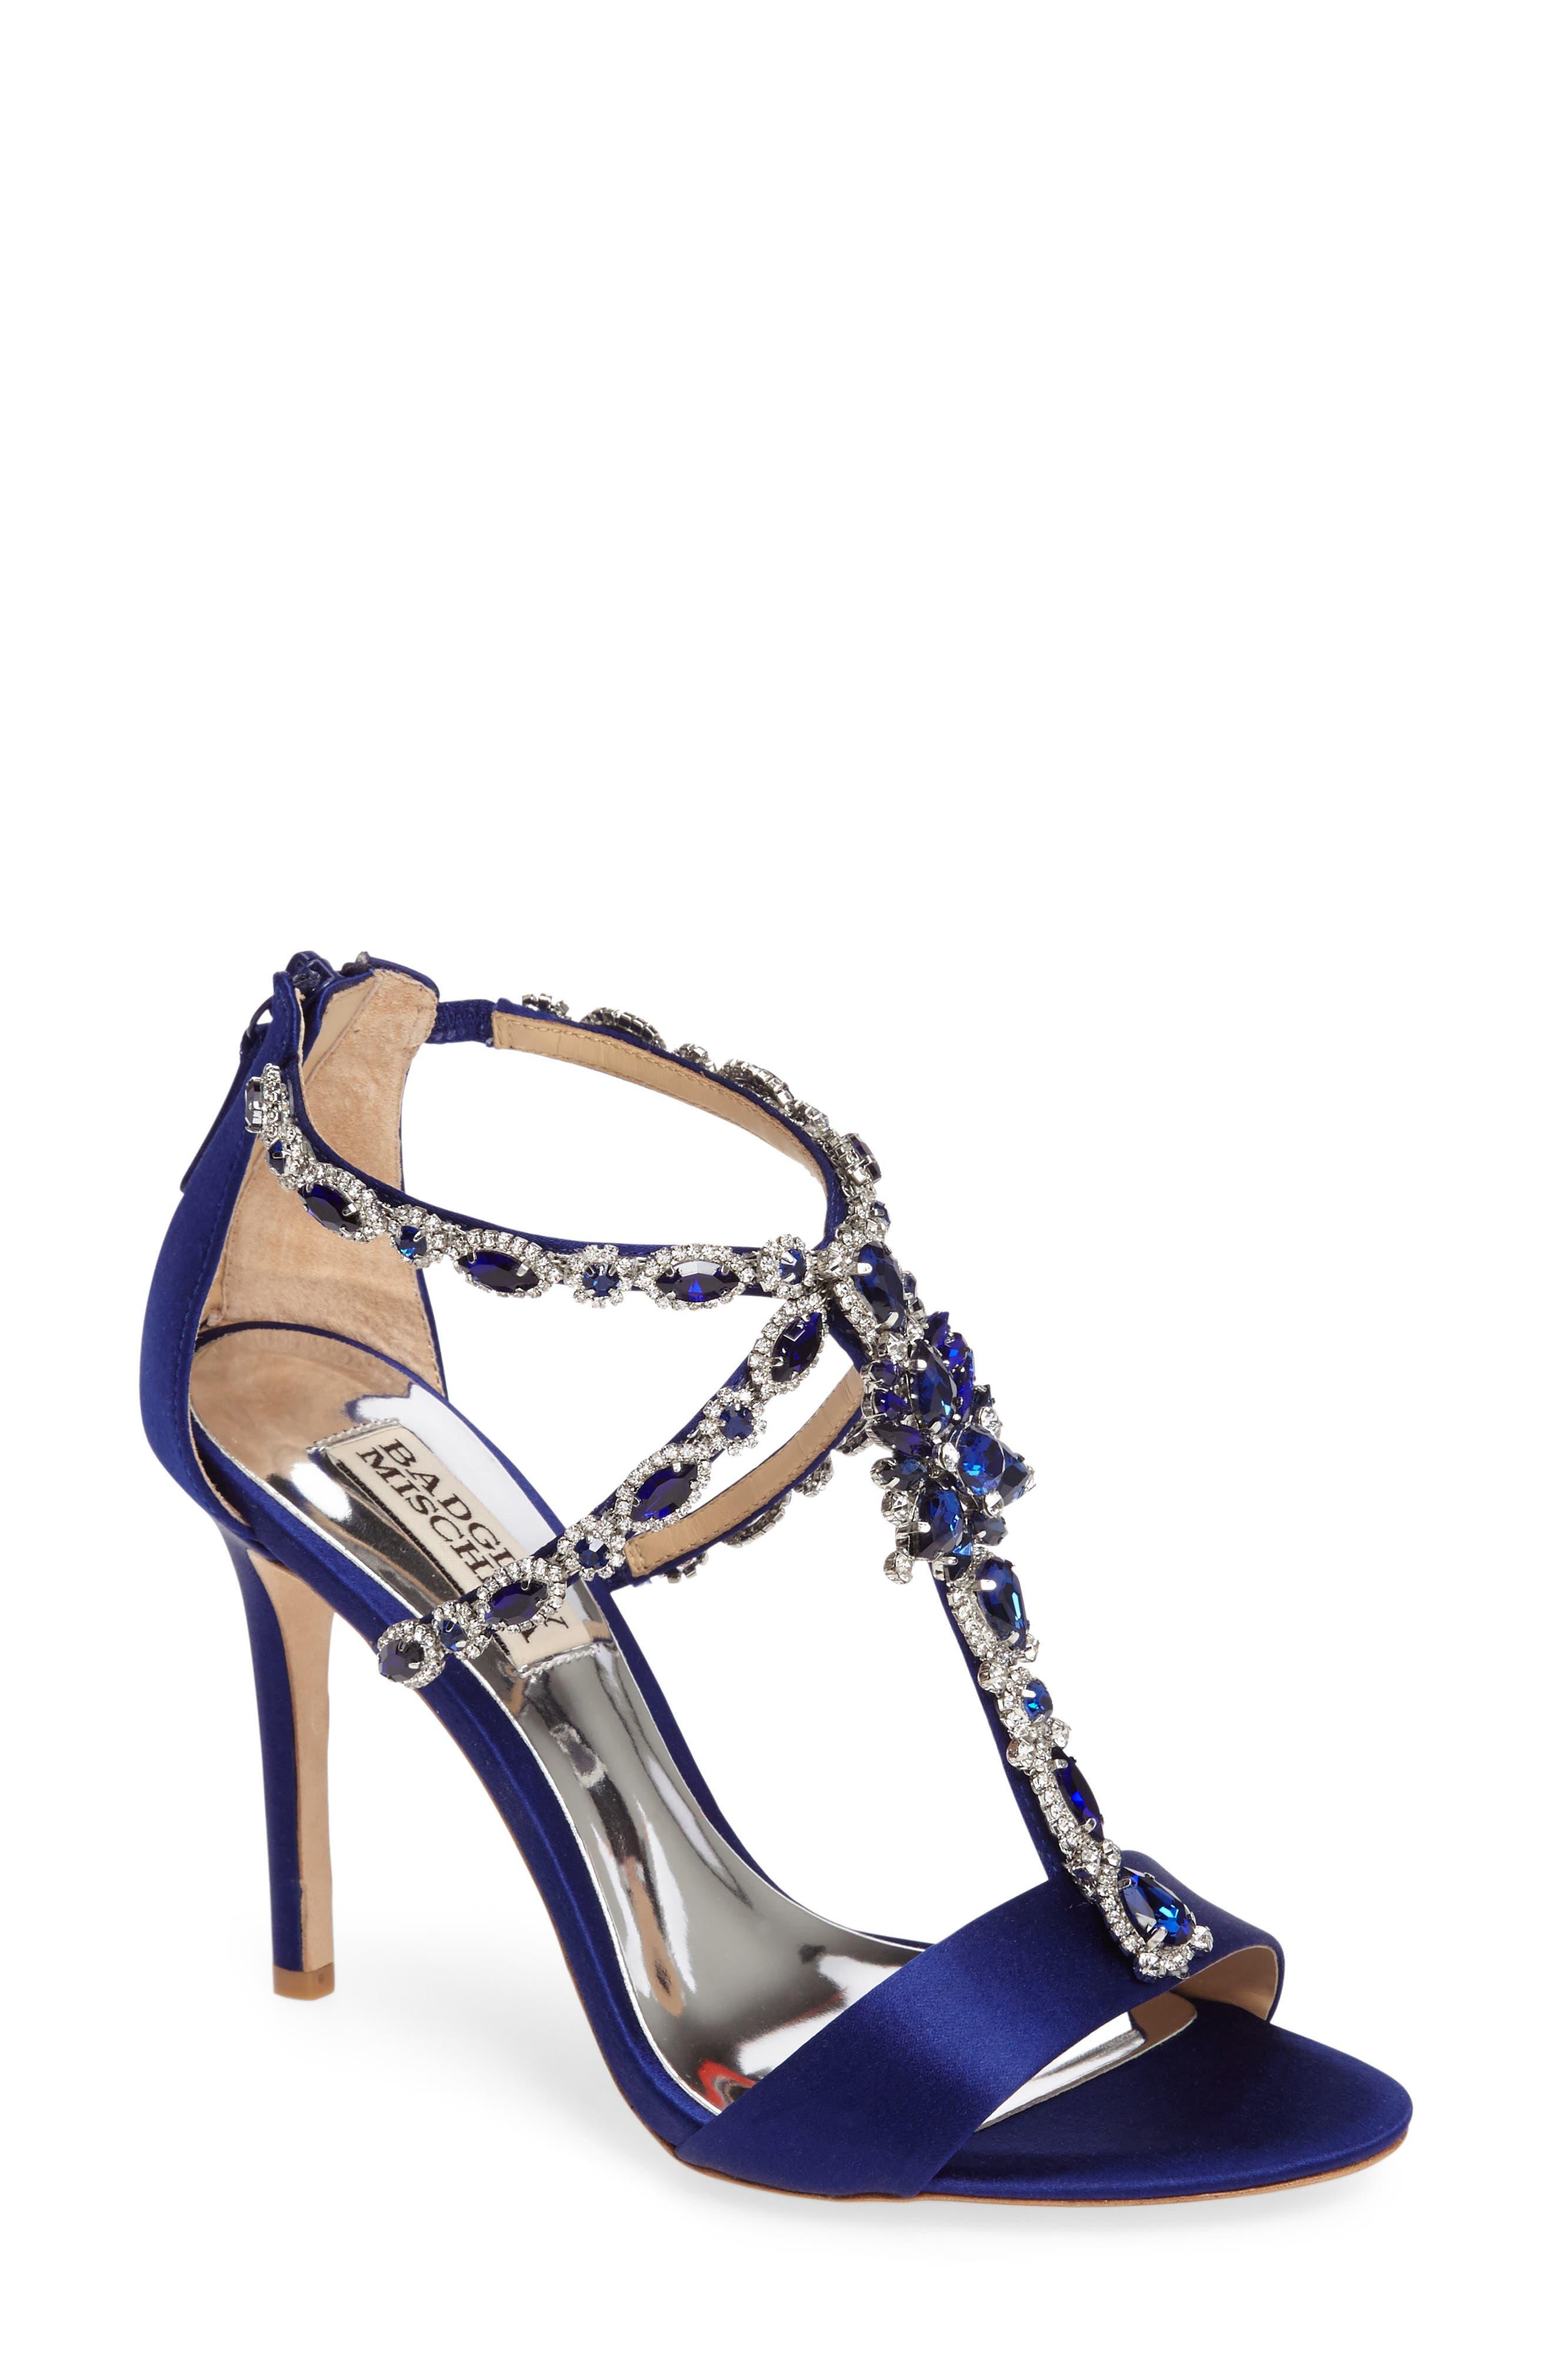 Main Image - Badgley Mischka Georgia Crystal Embellished T-Strap Sandal (Women)